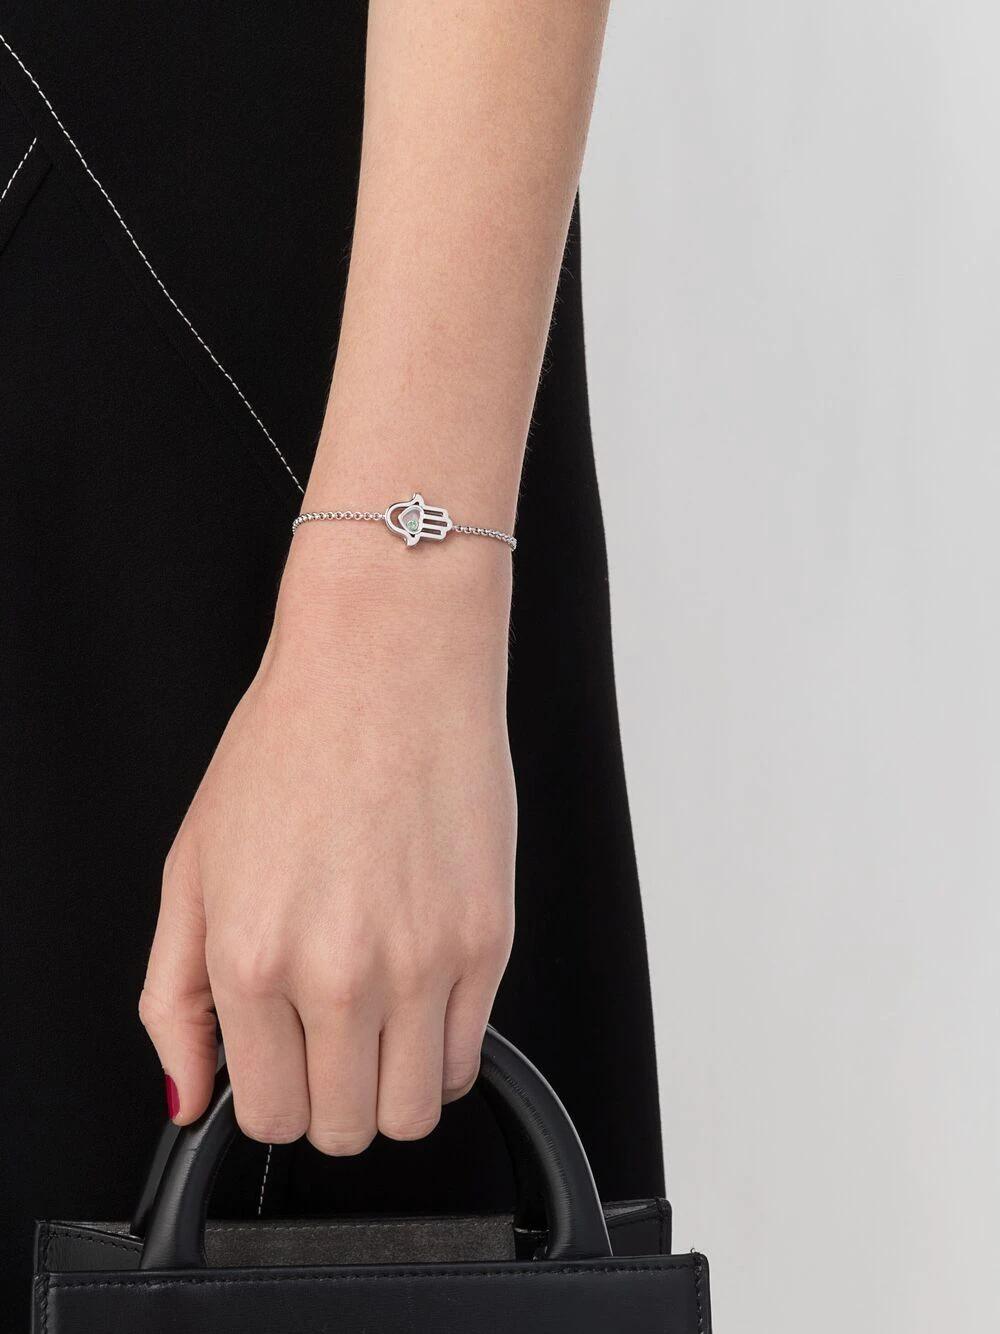 Chopard | Chopard браслет Good Luck Charms из белого золота с бриллиантами | Clouty